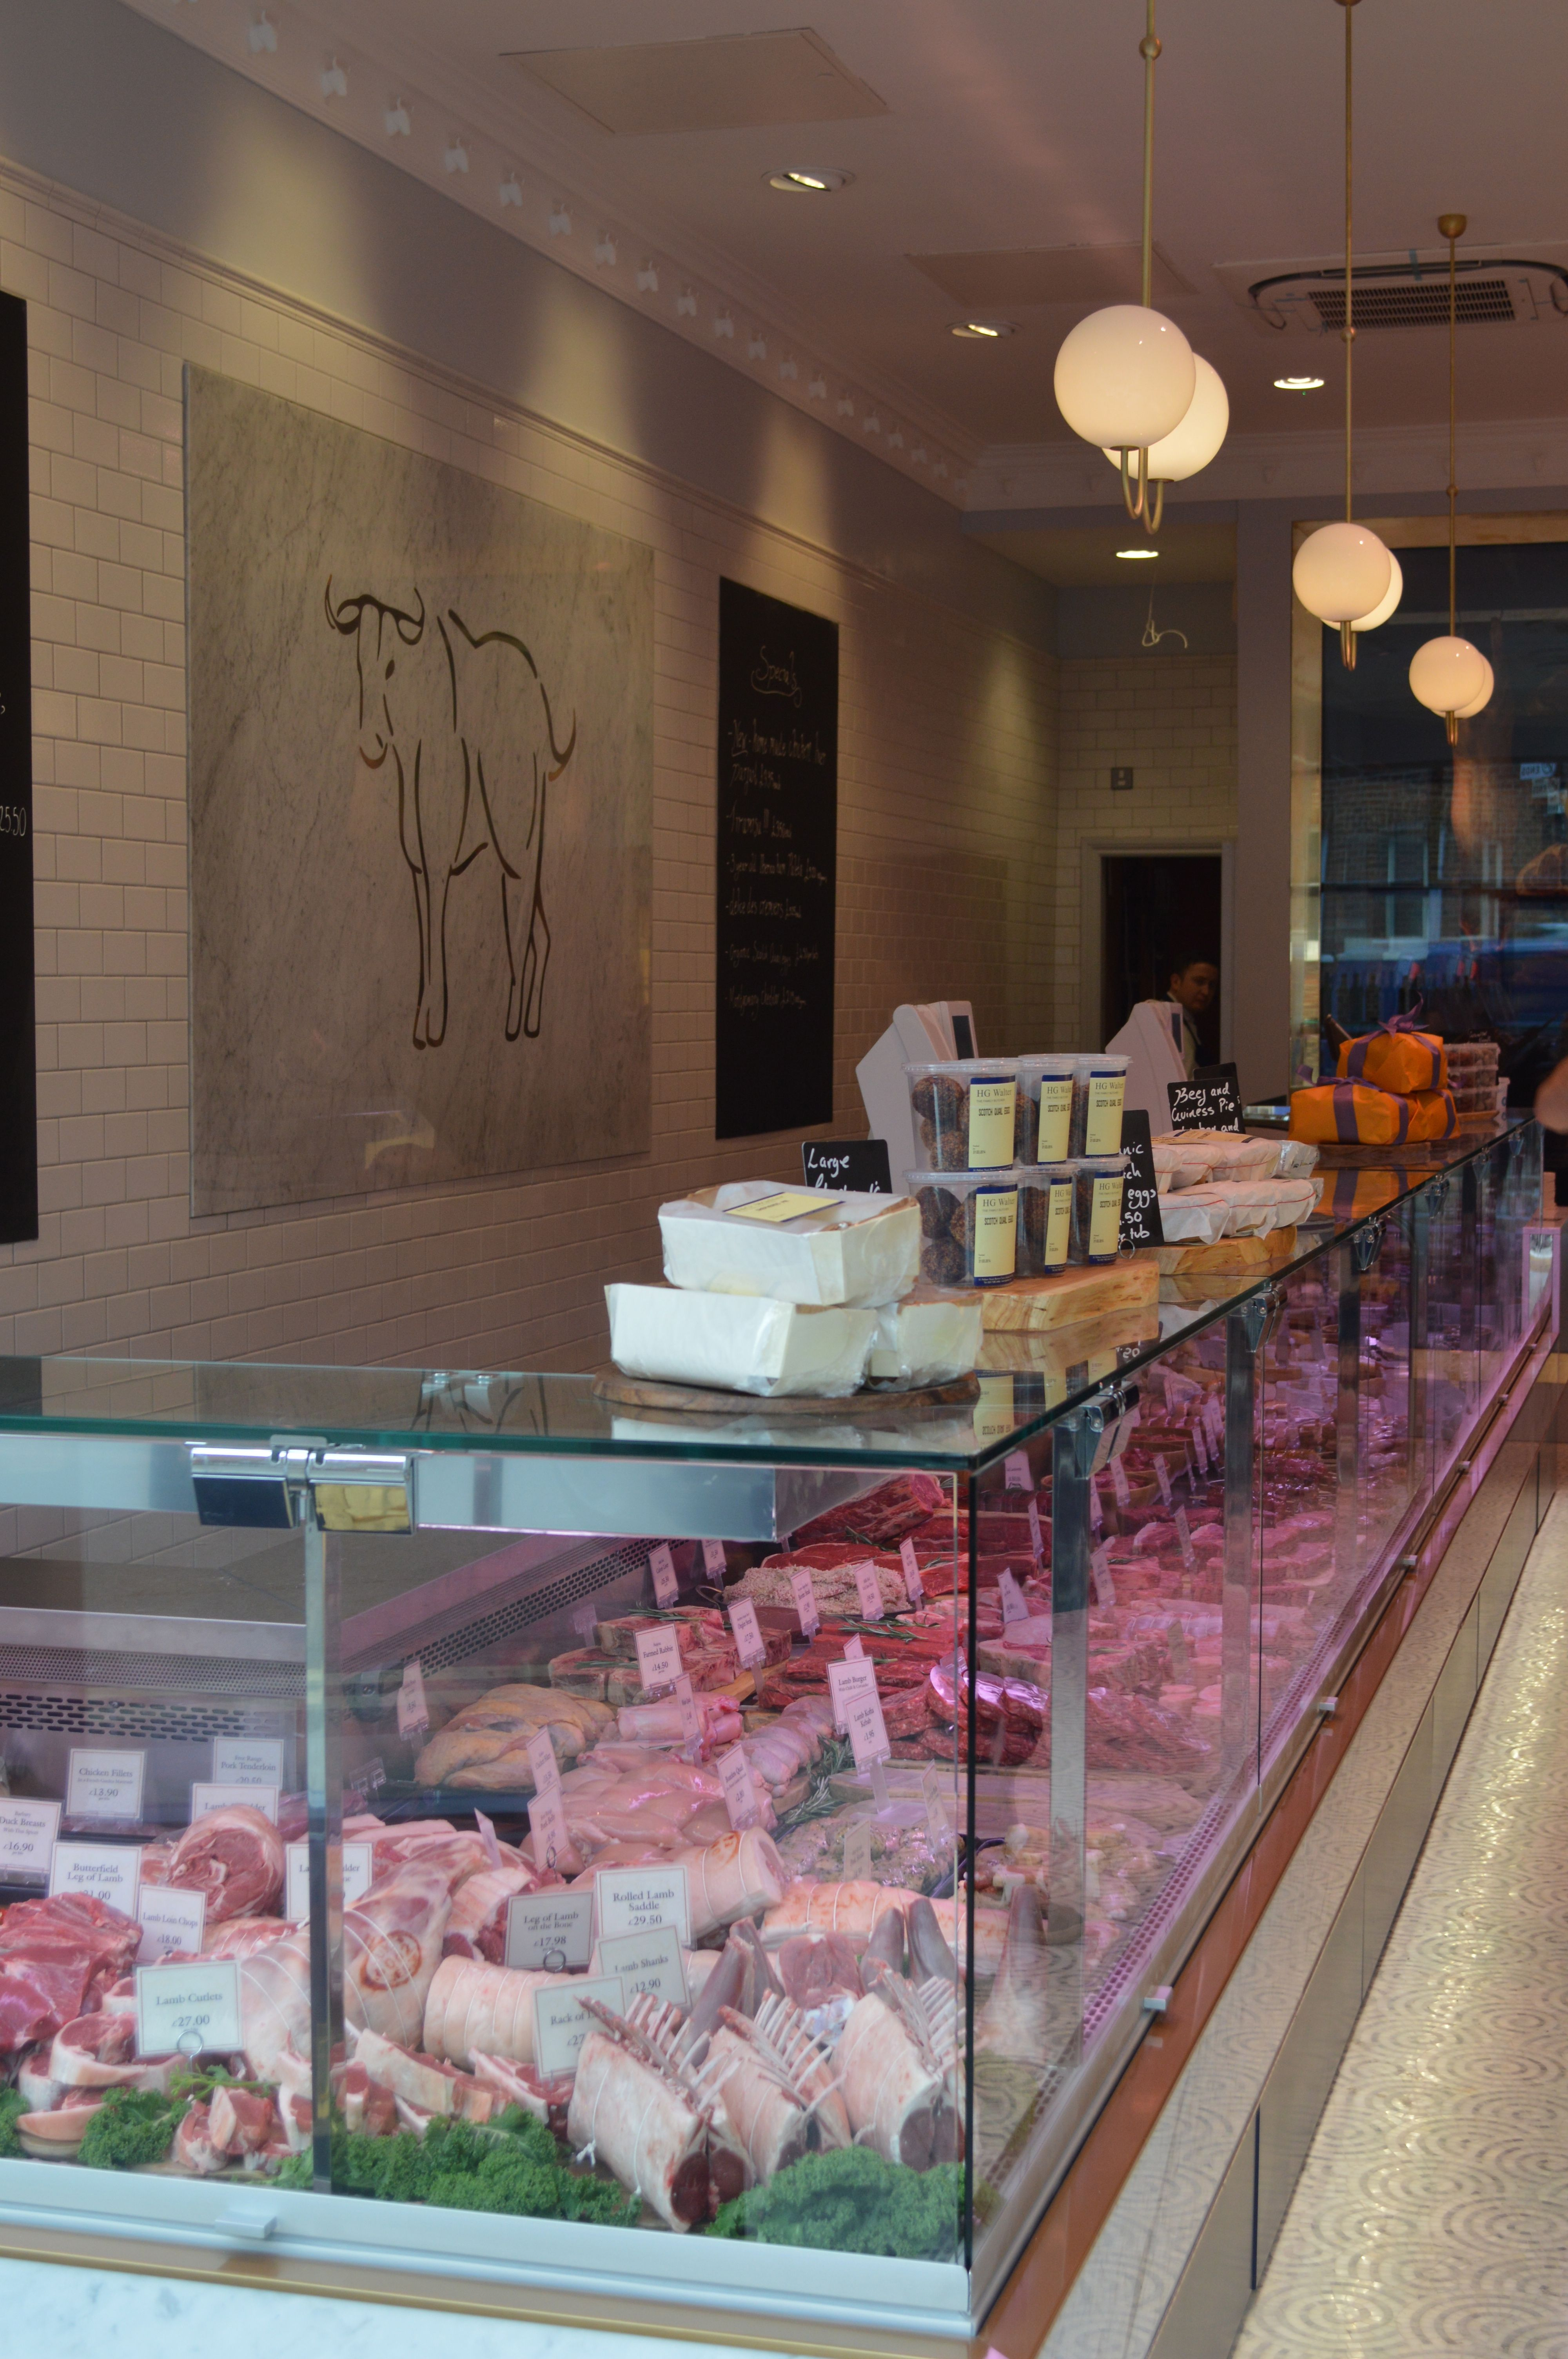 butcher shop design by tania payne interiors ltd butchertown hall pinterest boucherie. Black Bedroom Furniture Sets. Home Design Ideas